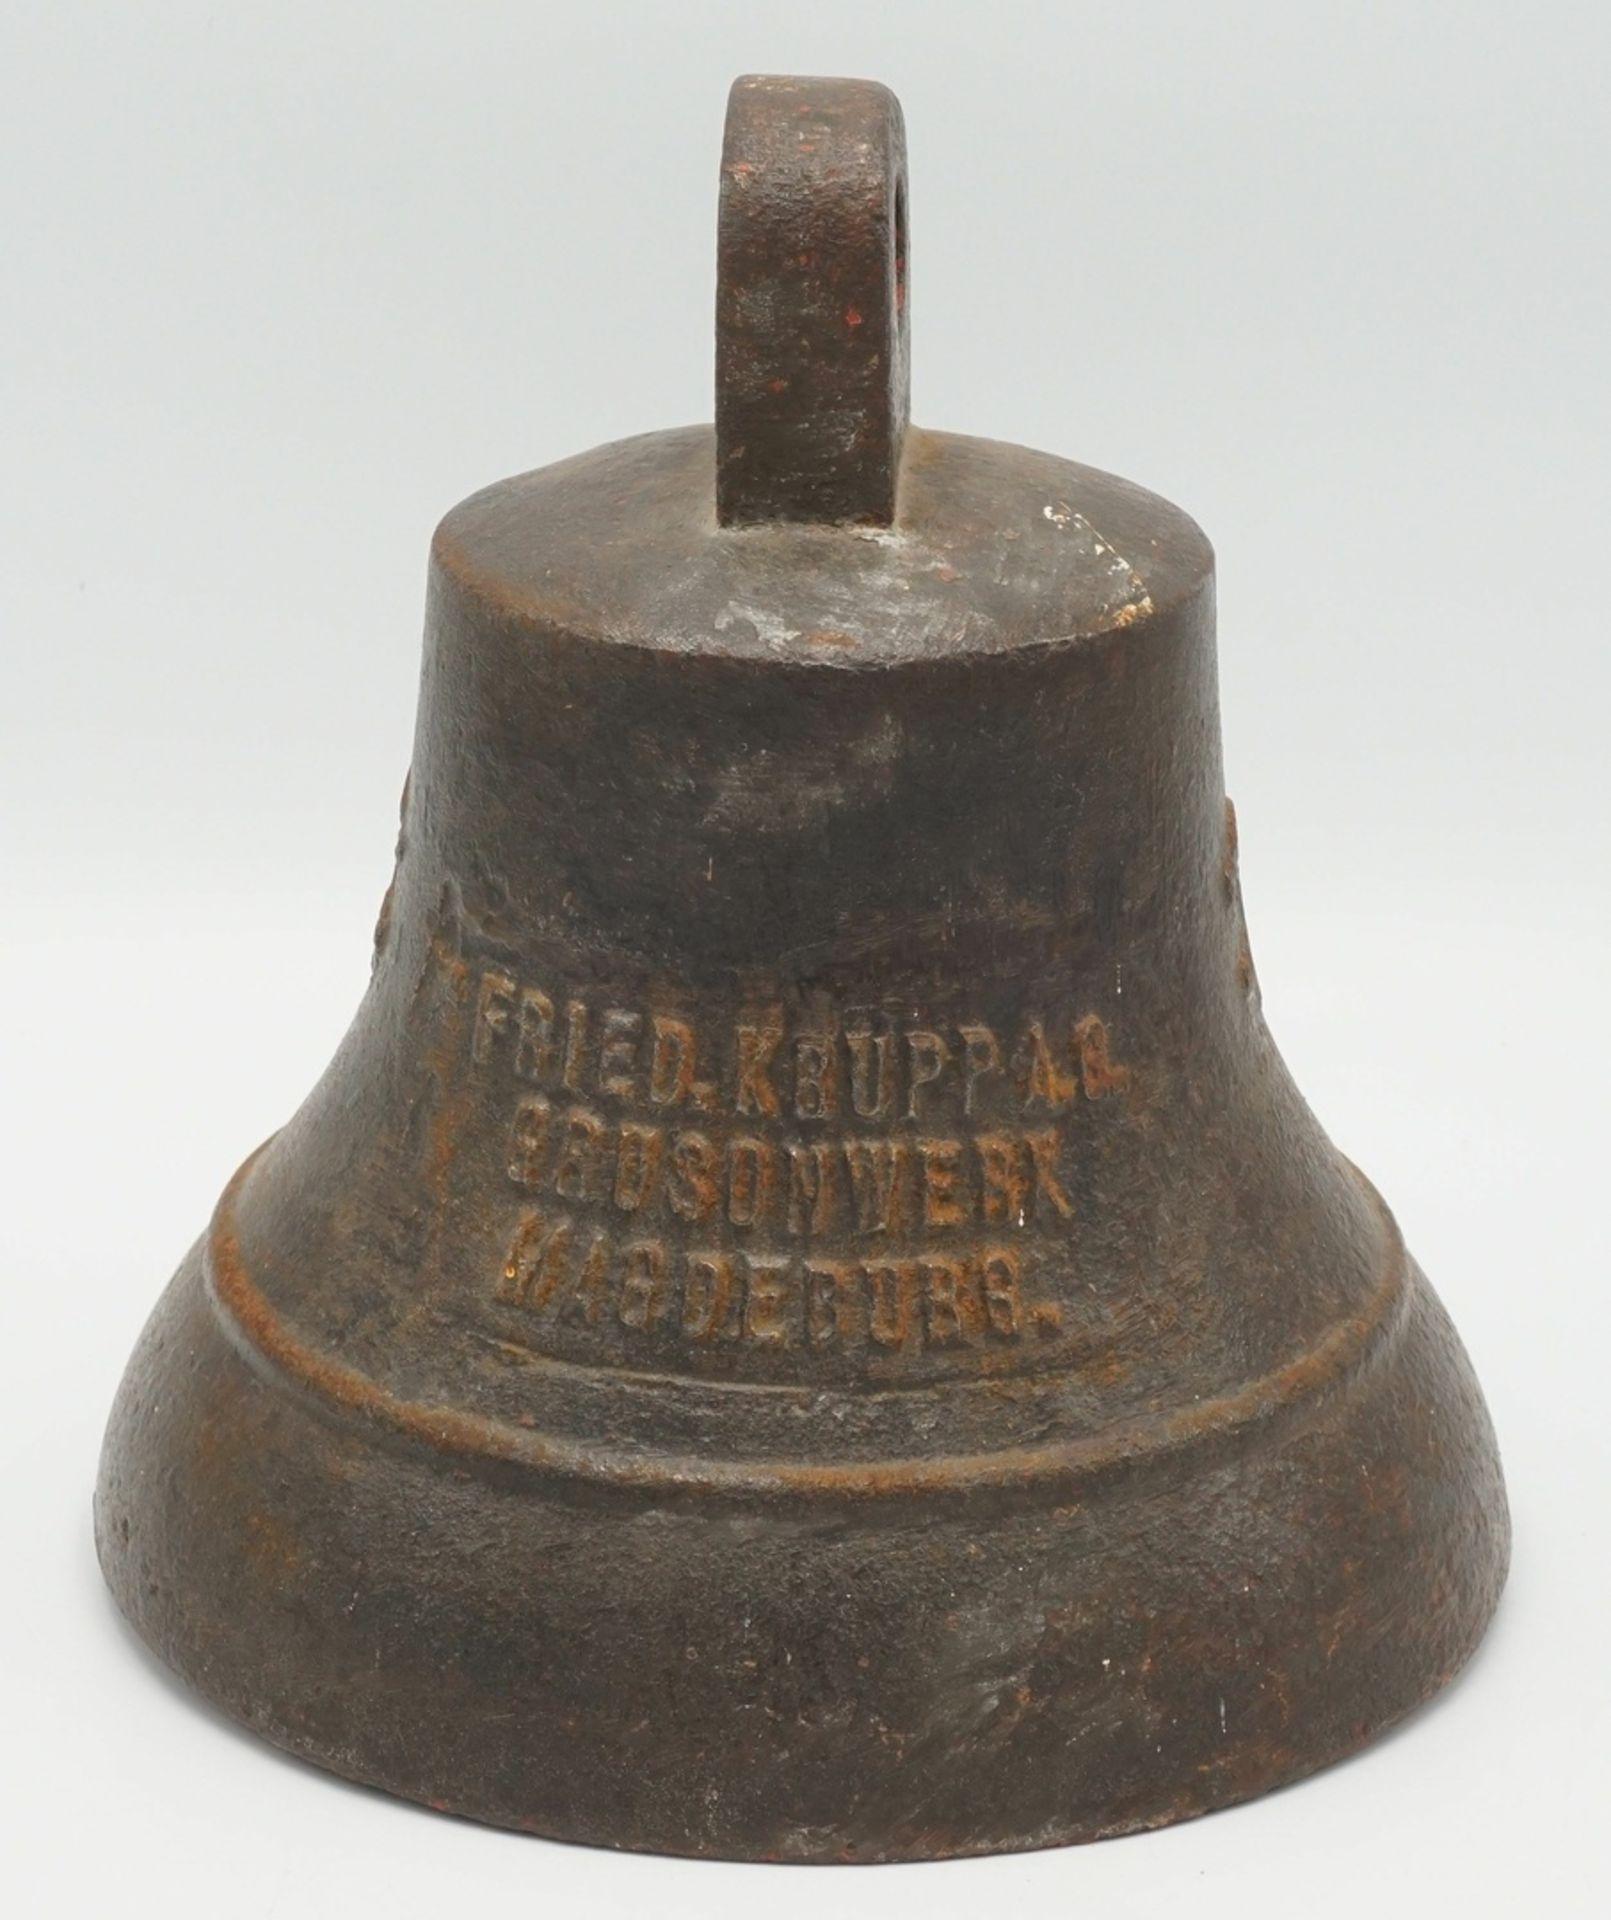 Glocke der Grusonwerke Magdeburg, wohl 1923-1945